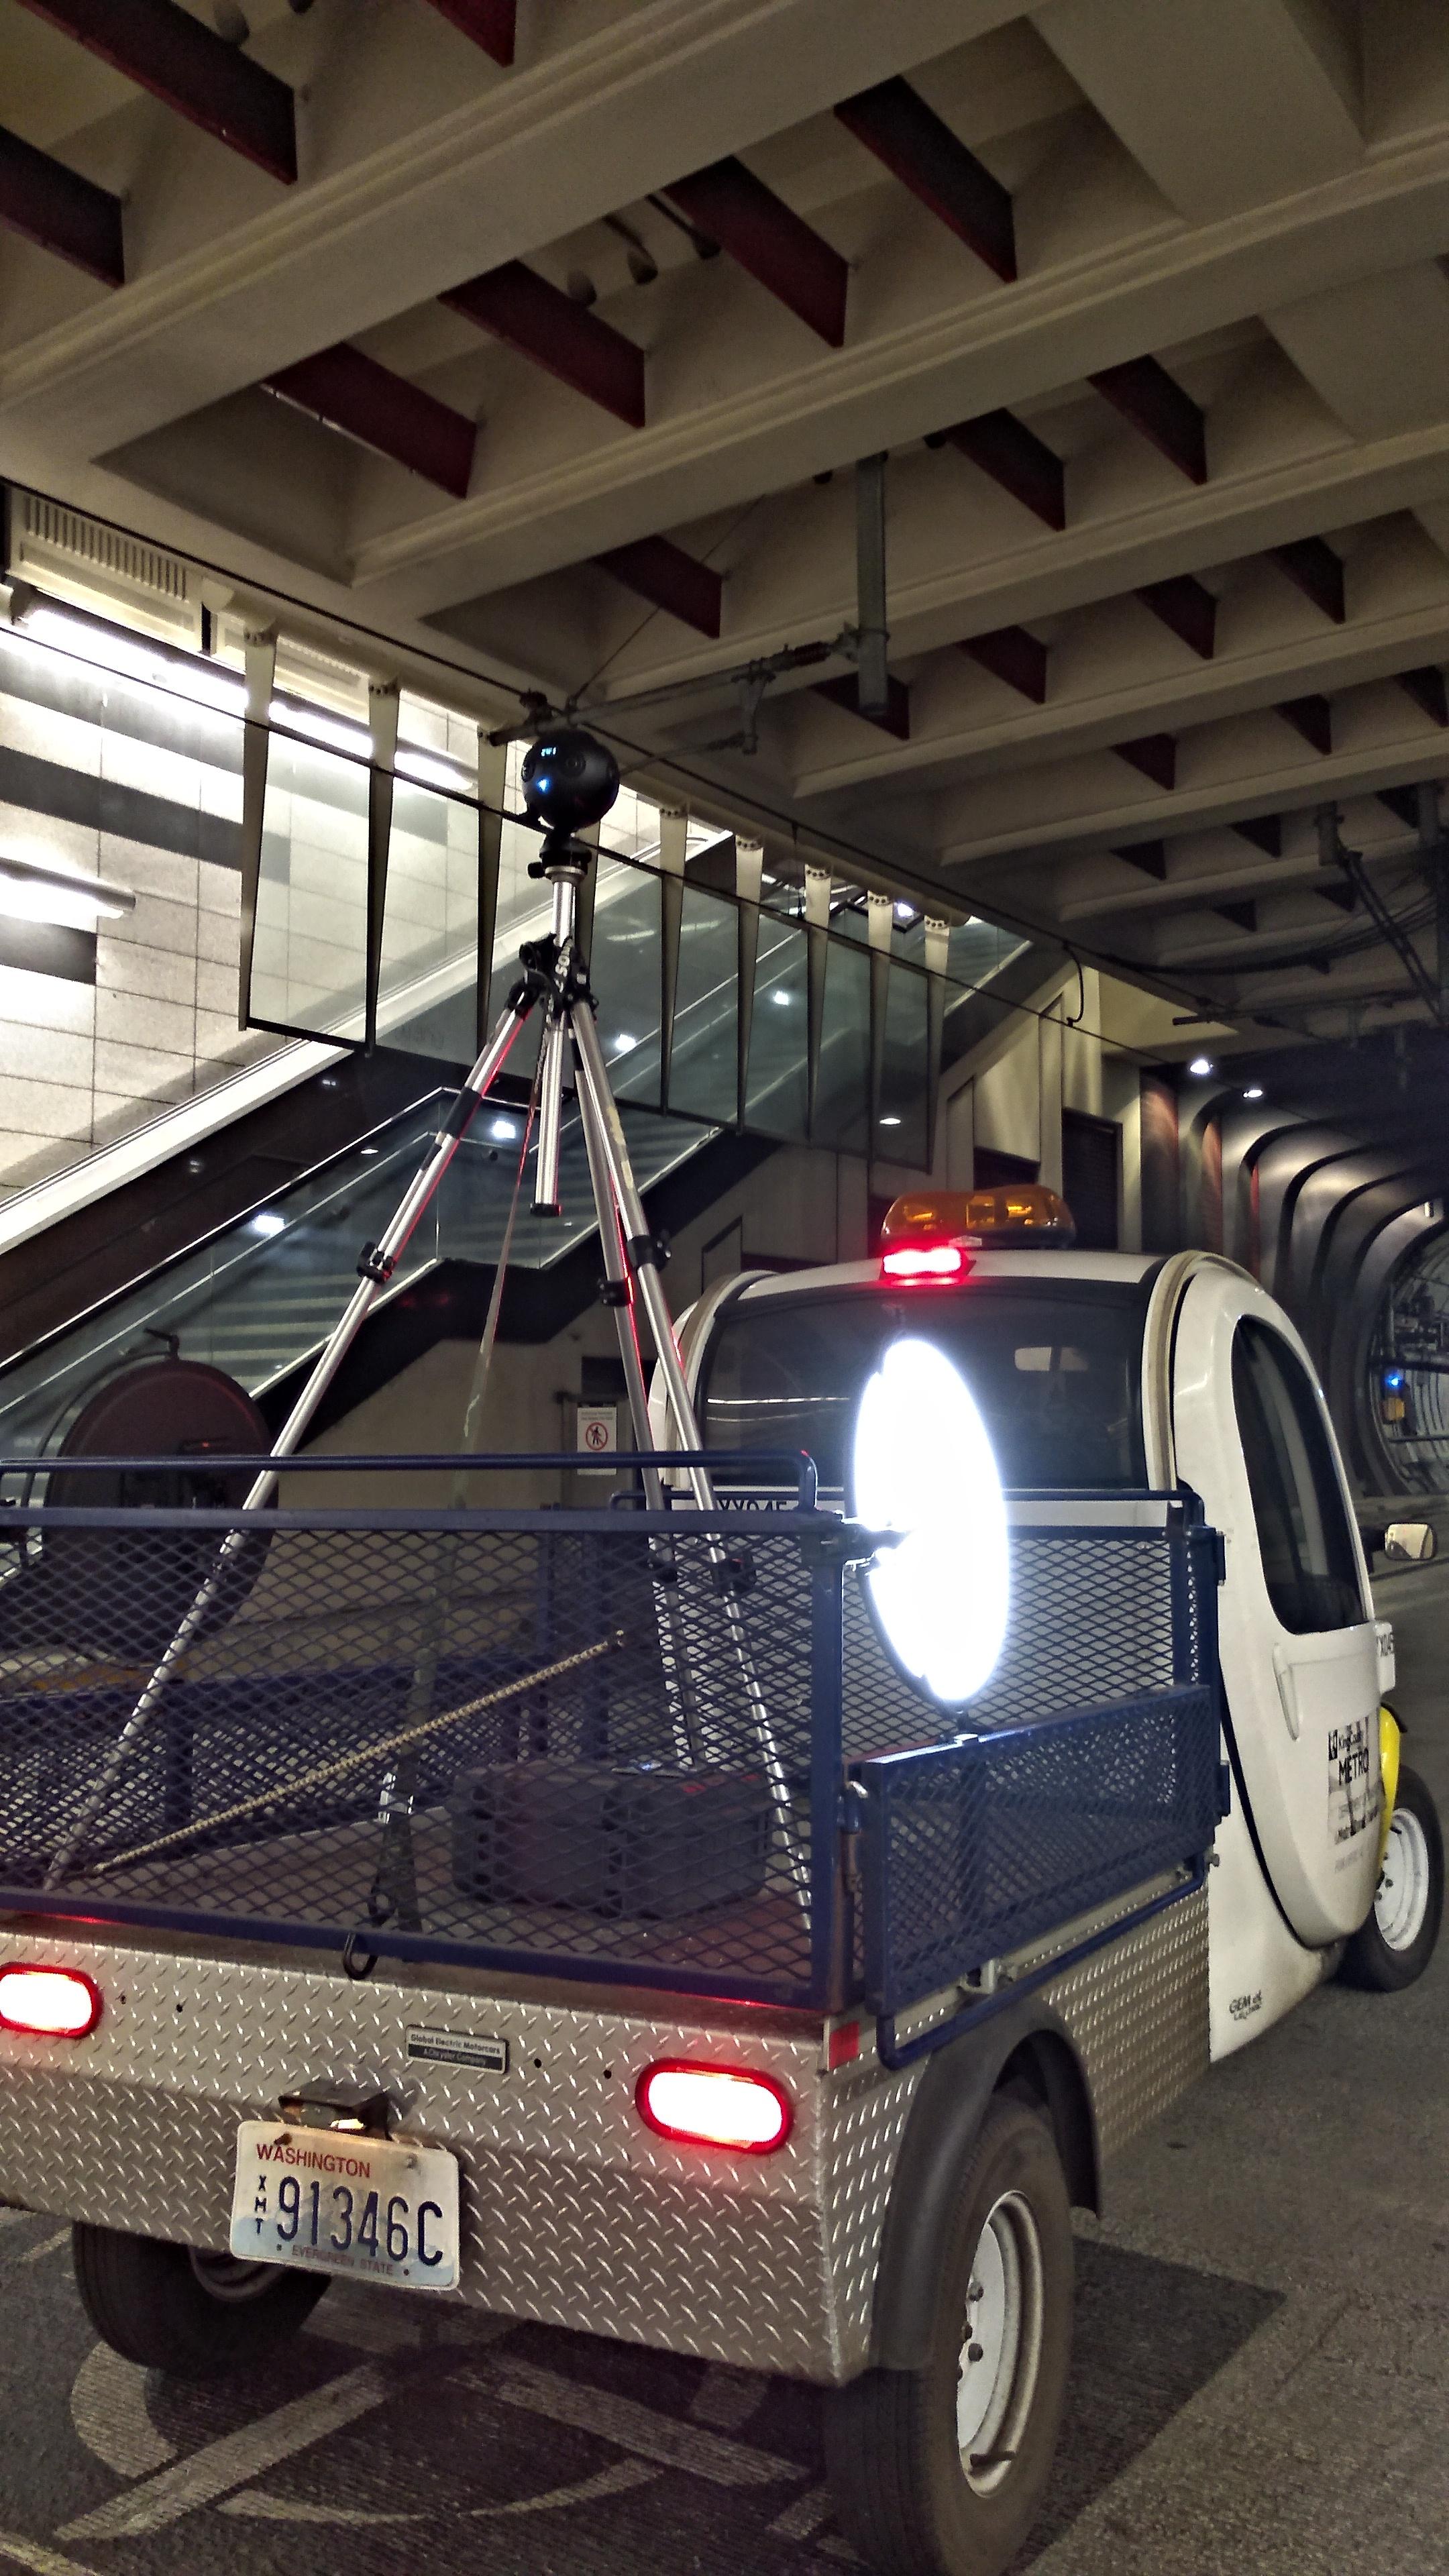 360 camera rig for underground transit shoot